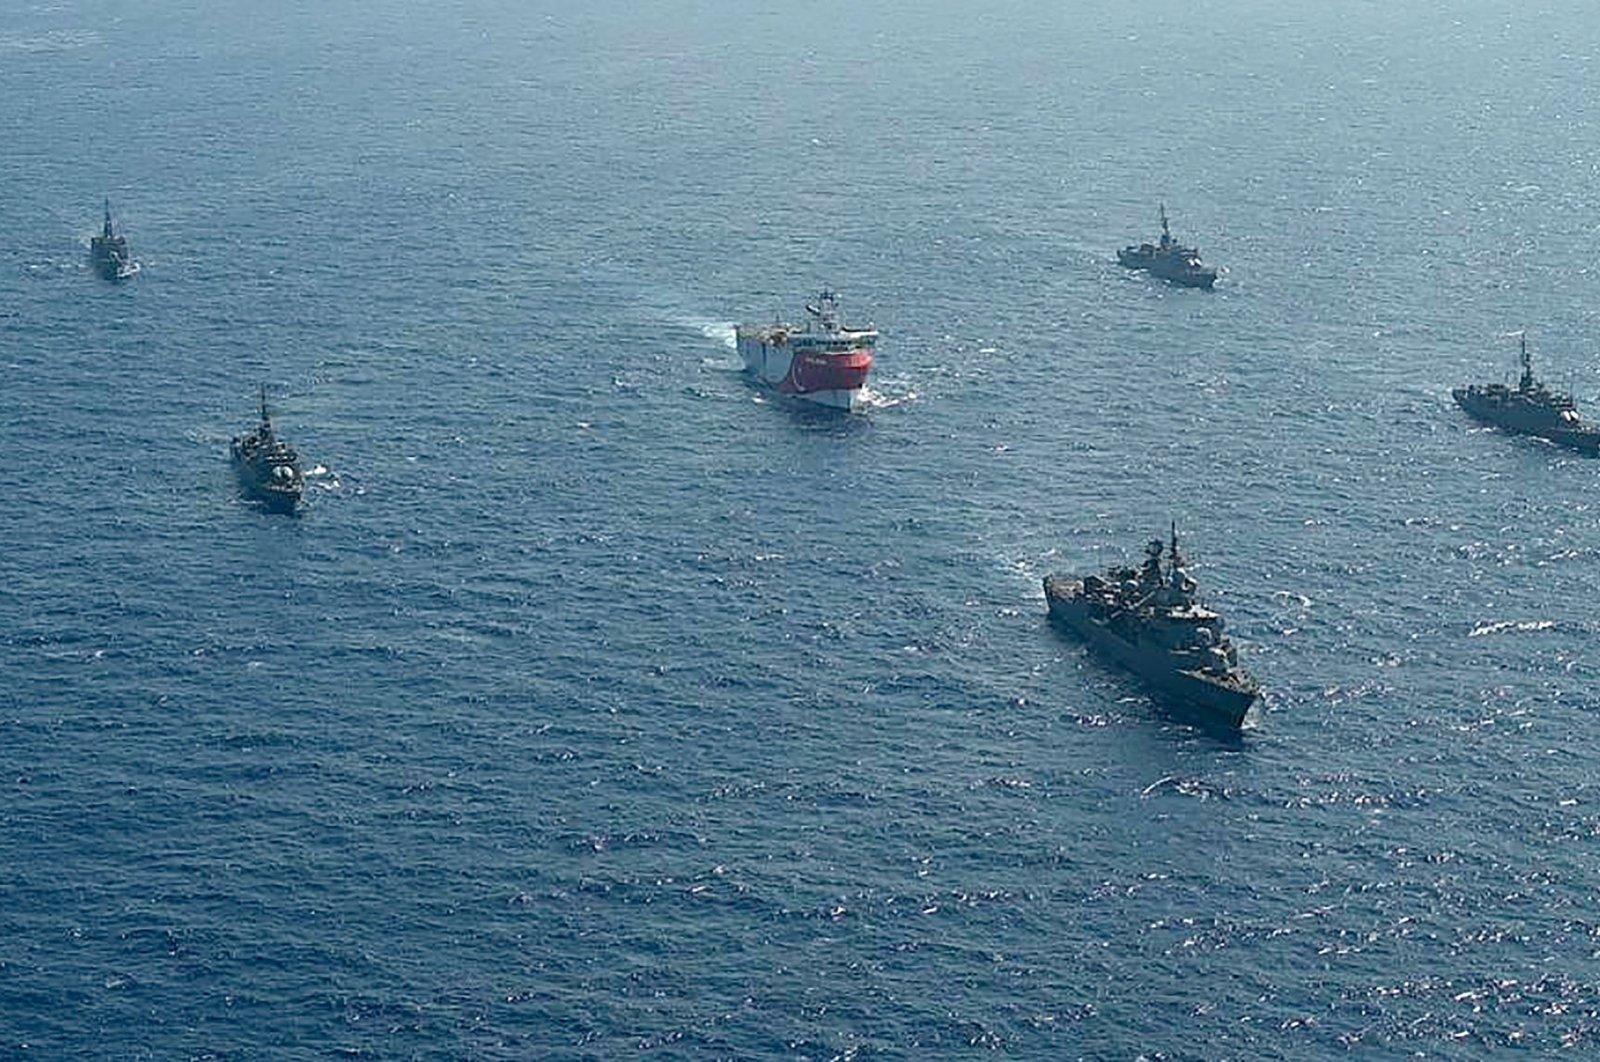 Turkish seismic research vessel Oruç Reis is escorted by Turkish Naval ships in the Mediterranean Sea, off Antalya, August 10, 2020. (AFP Photo)